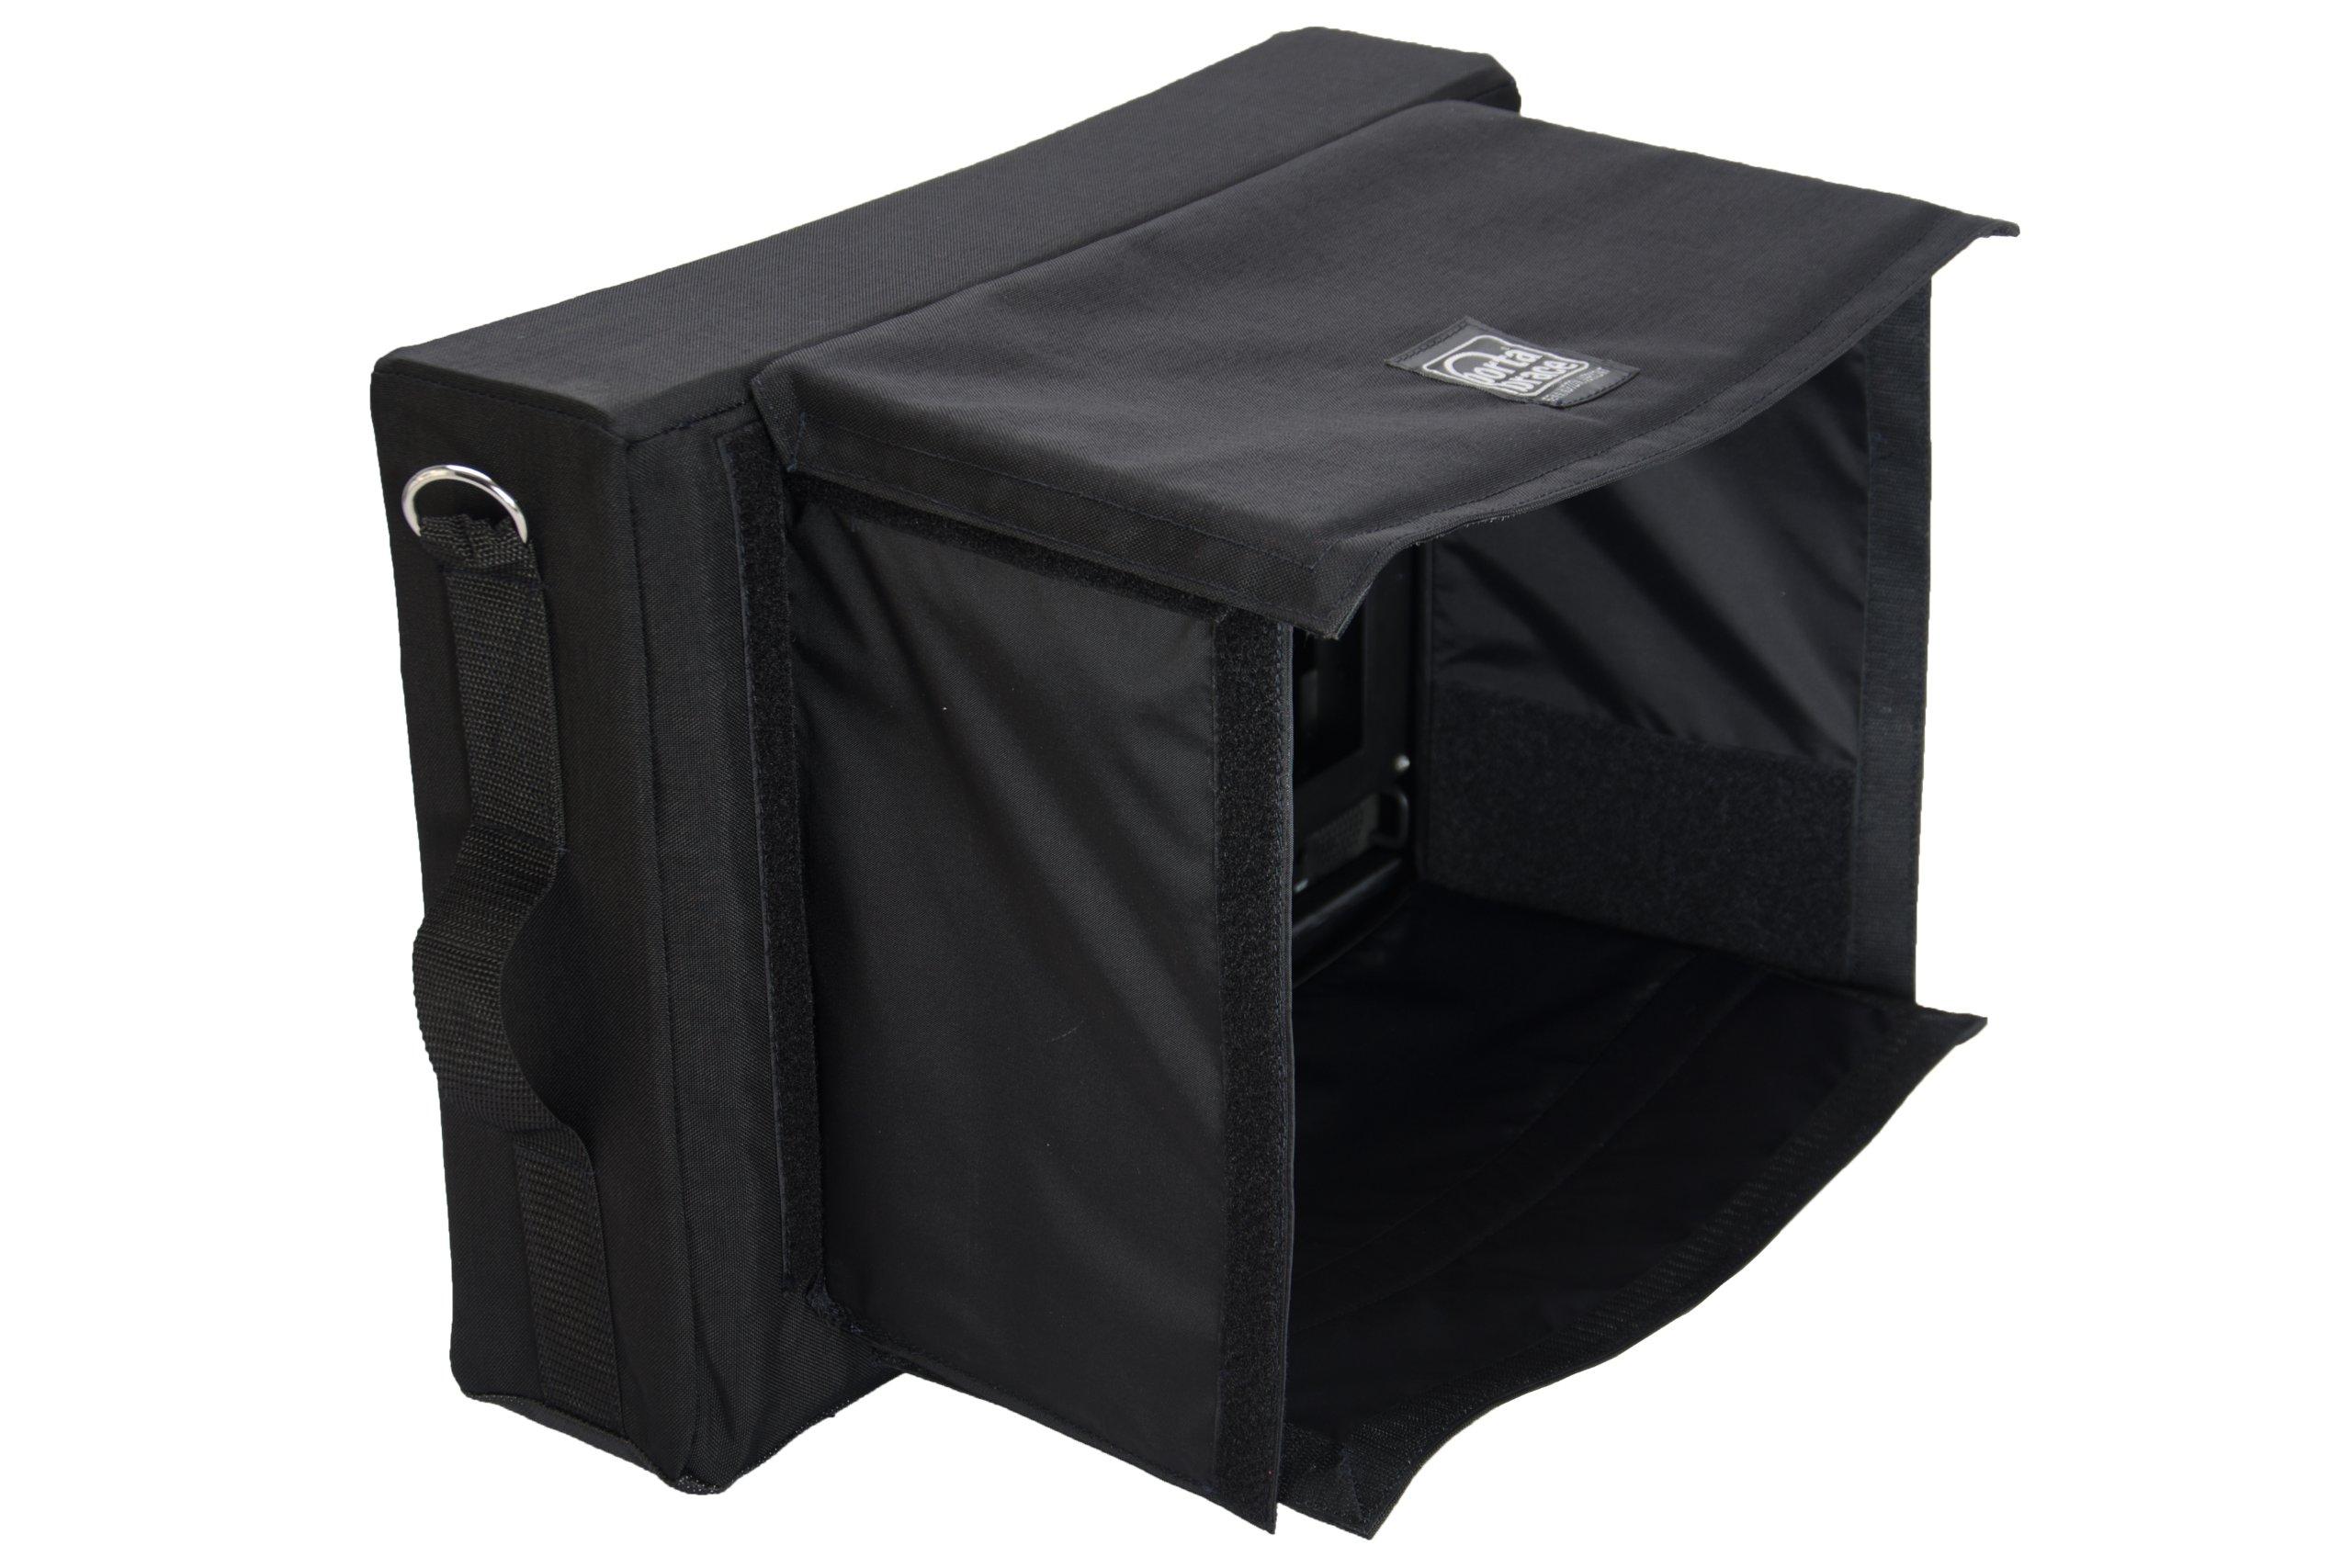 PortaBrace MO-17G Camera Case (Black)